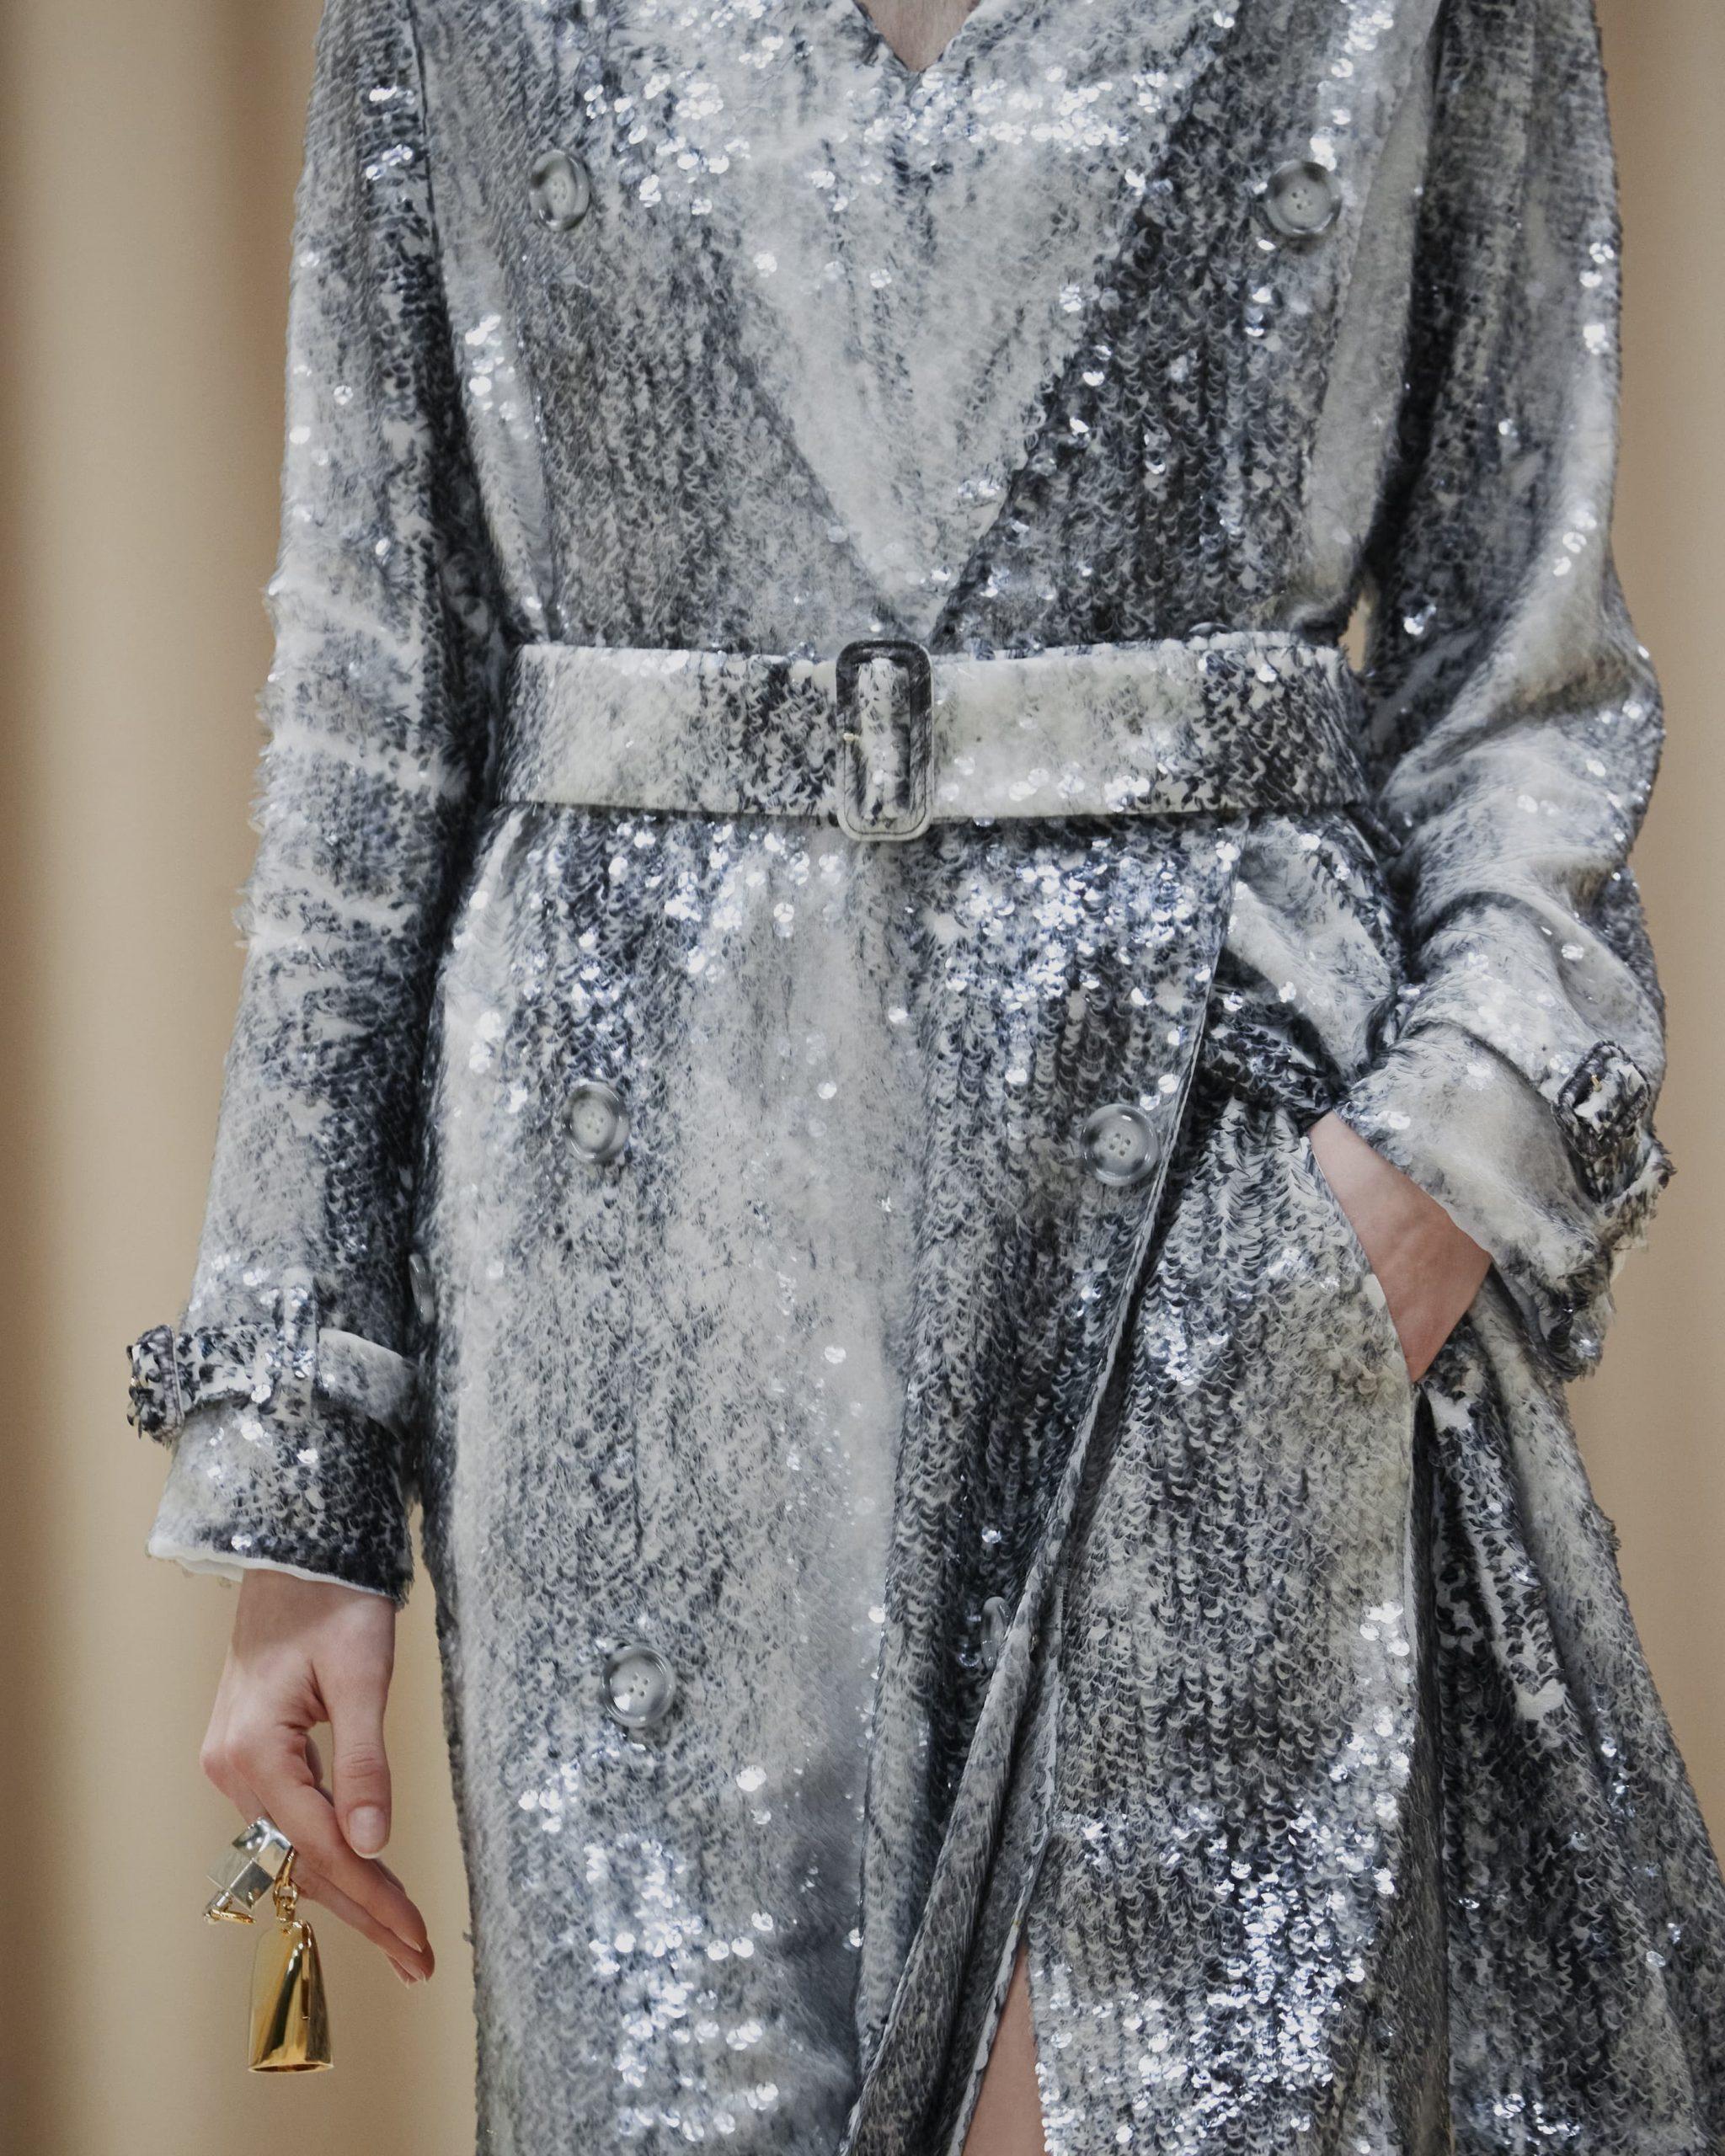 Burberry Fall 2021 Fashion Show Details